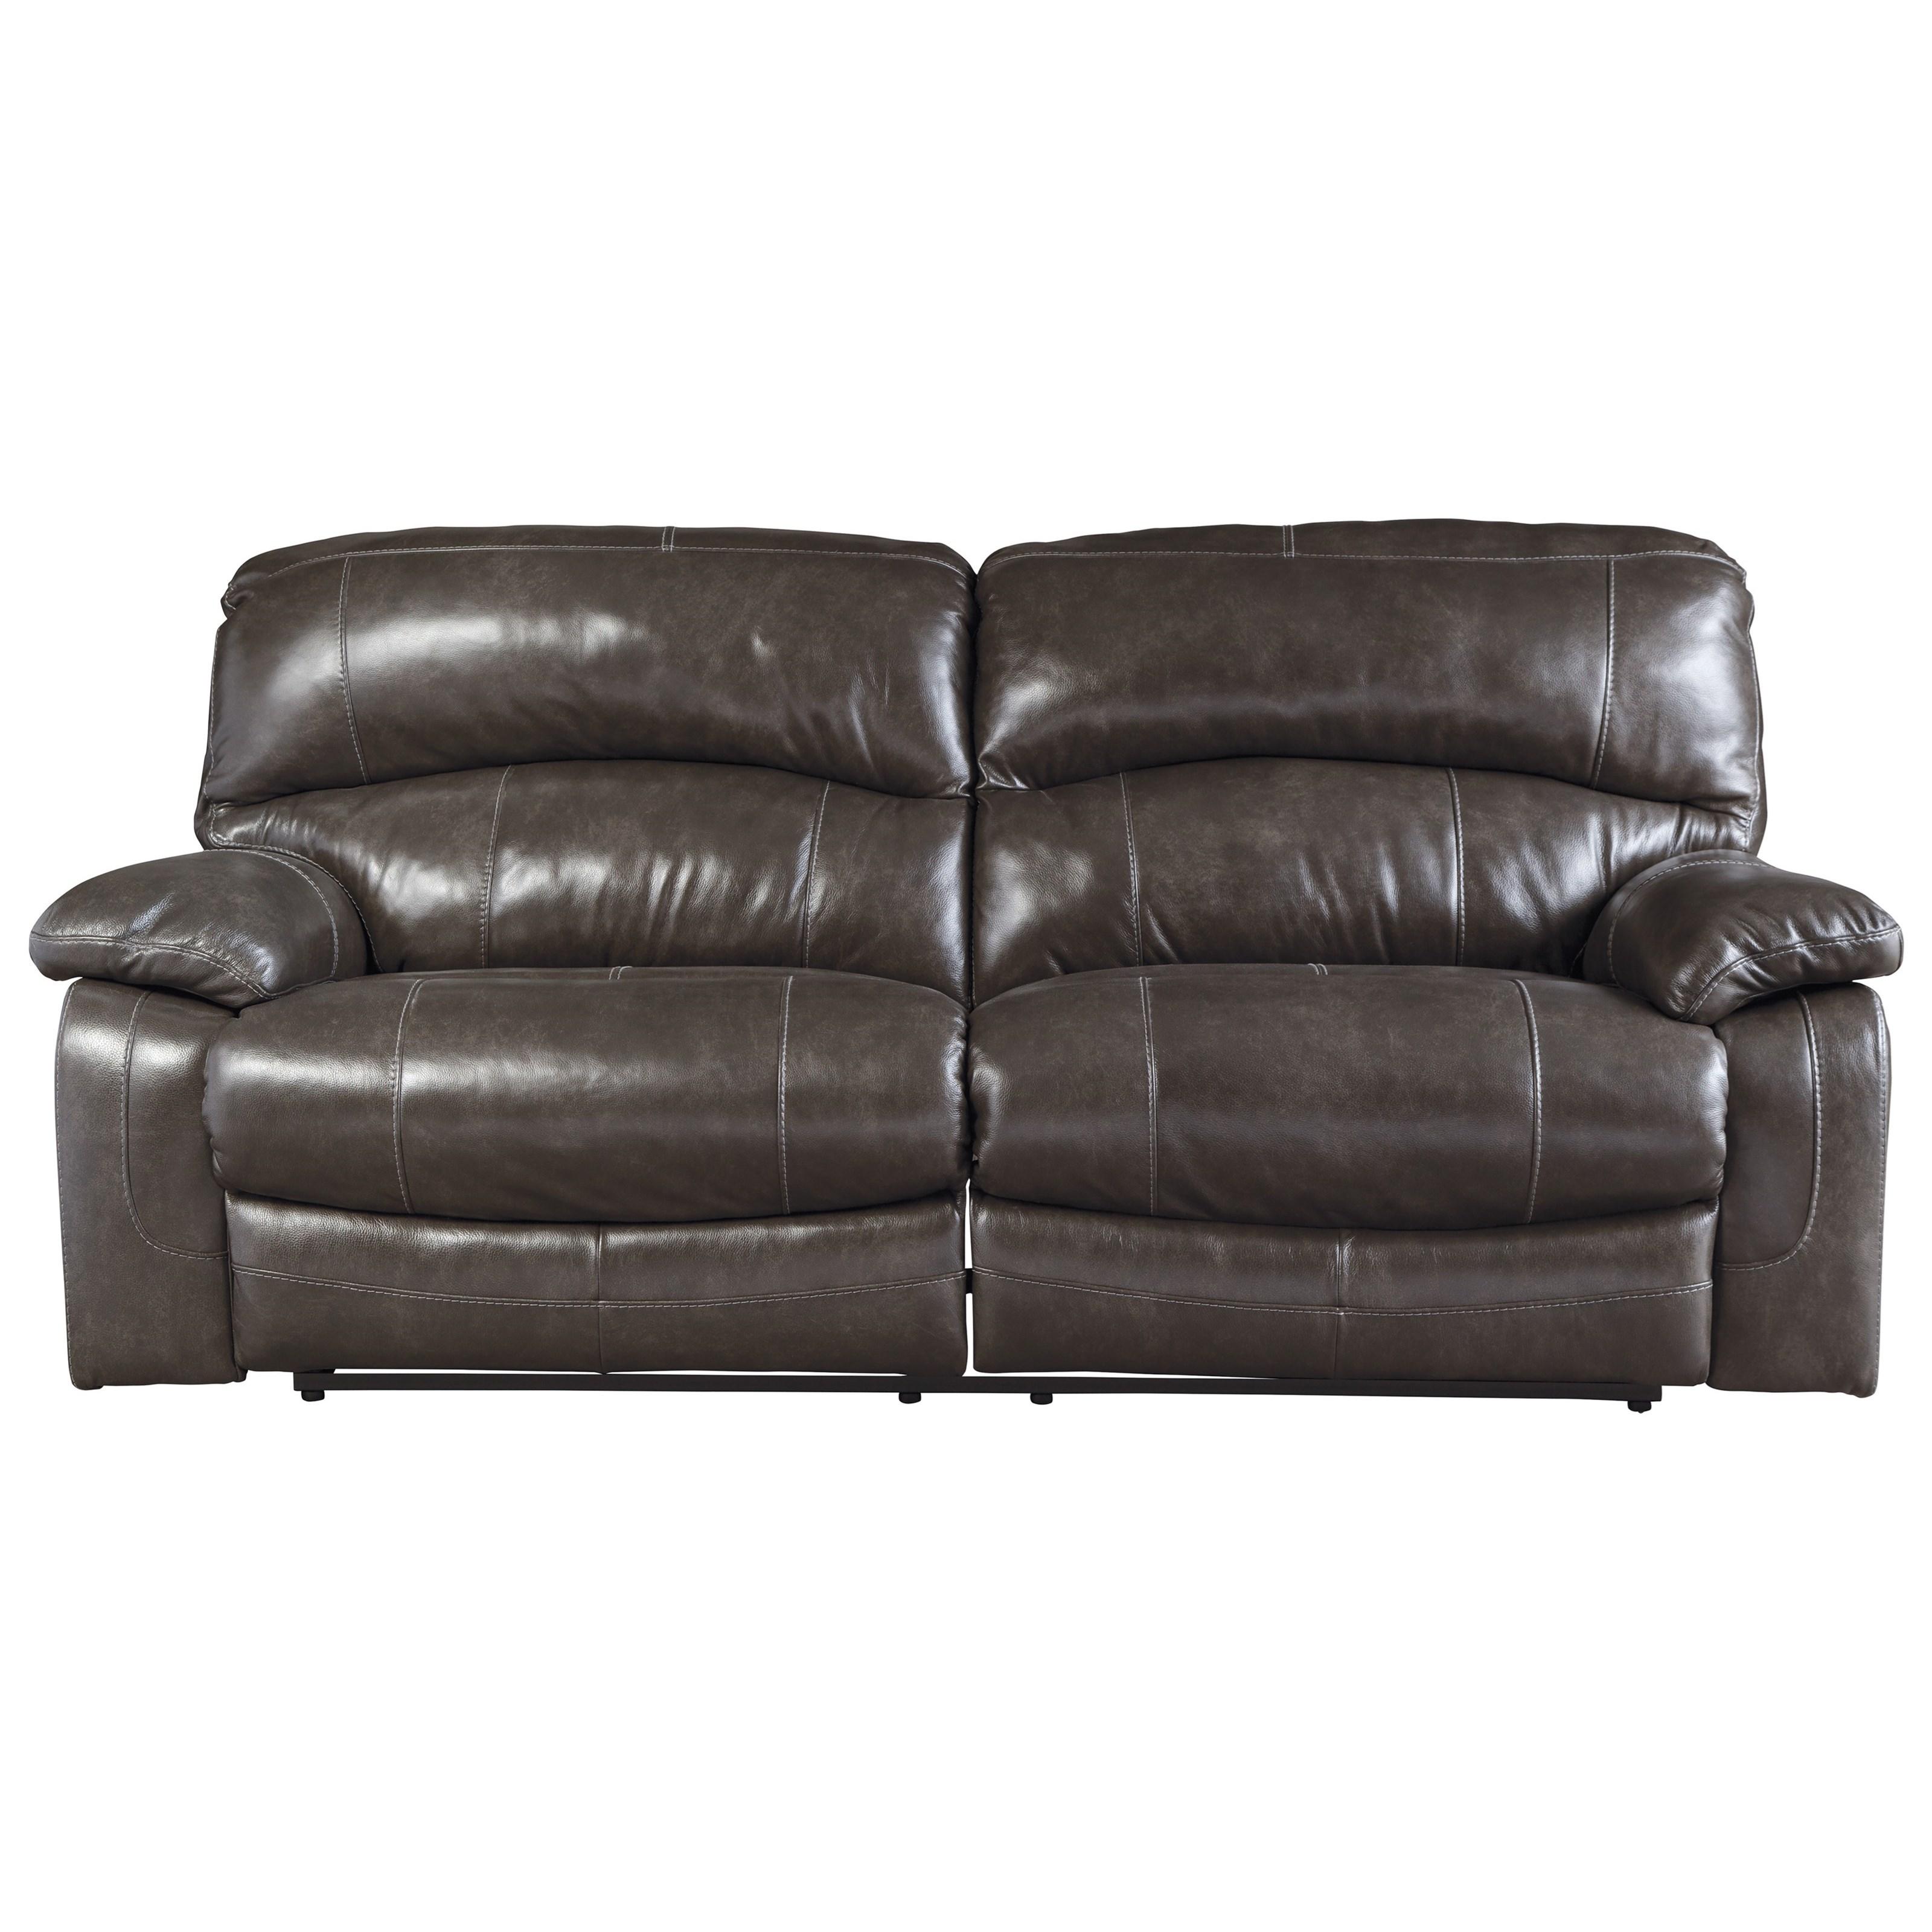 Signature Design By Ashley Damacio Metal U9821381 Leather Match 2 Seat Reclining Sofa